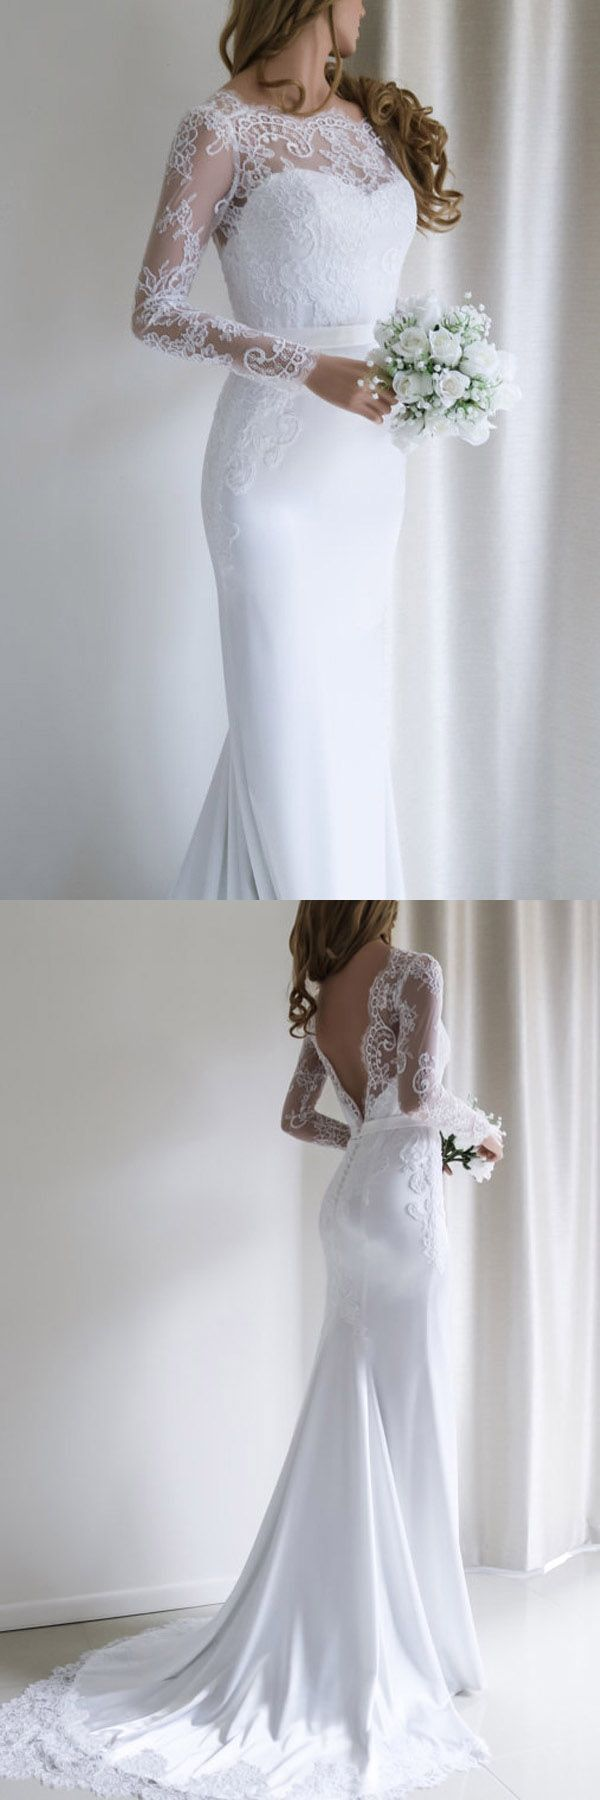 http://diamond-engagement-rings.pro #EngagementRings